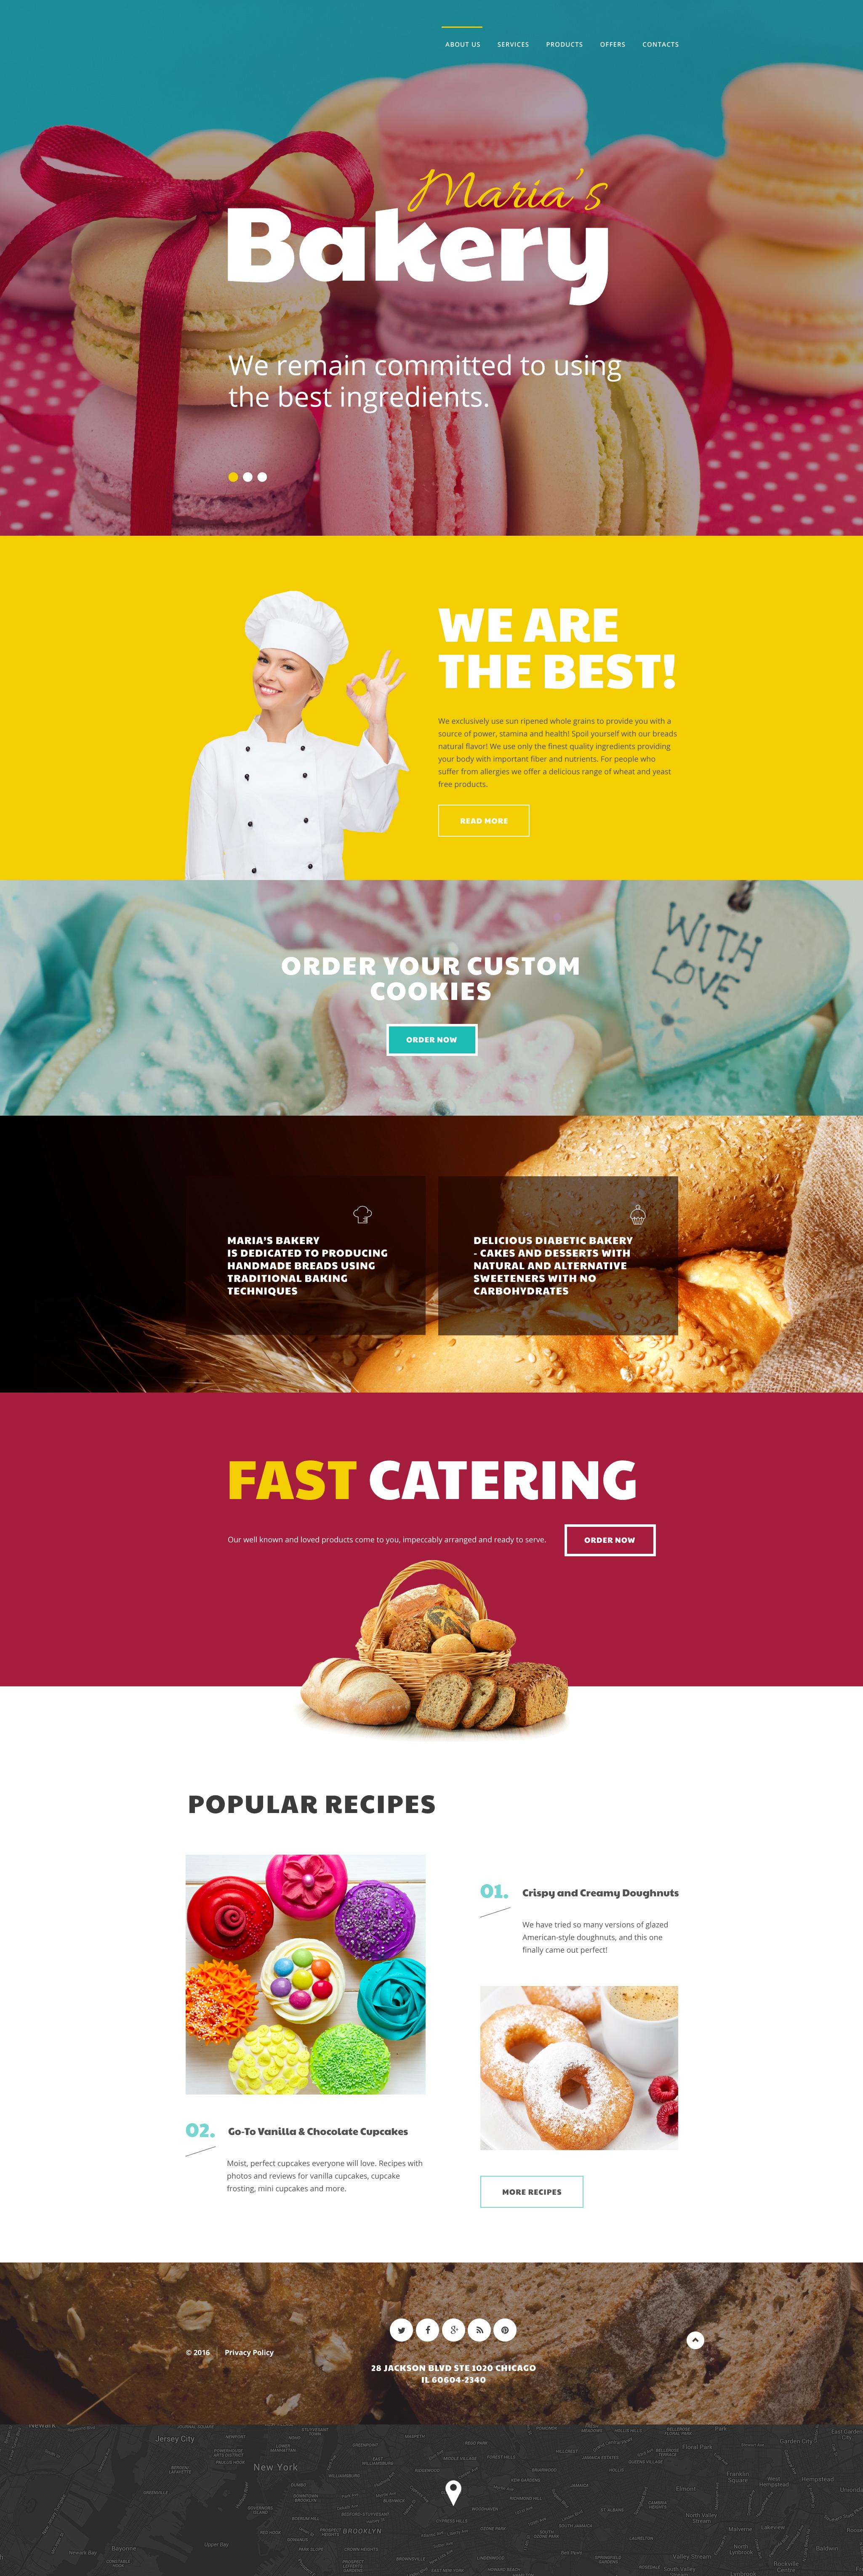 """Maria's Bakery"" - адаптивний Шаблон сайту №58701 - скріншот"